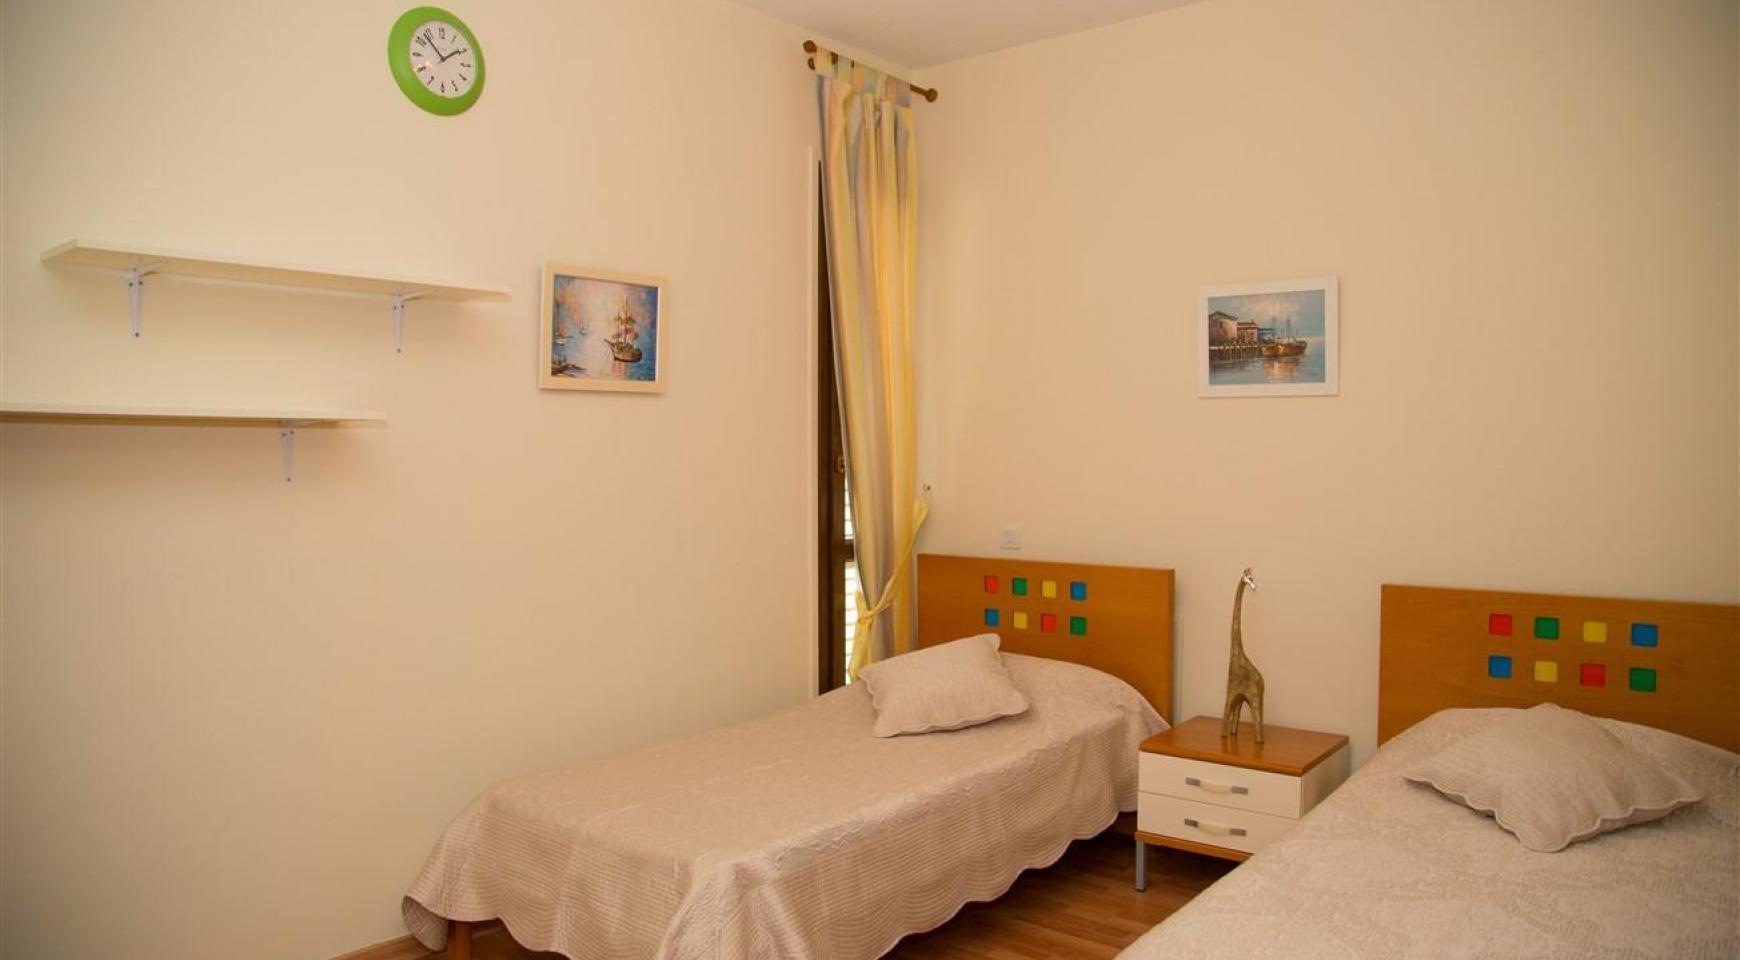 3-Спальная Квартира на Берегу Моря в Комплексе Thera   - 15